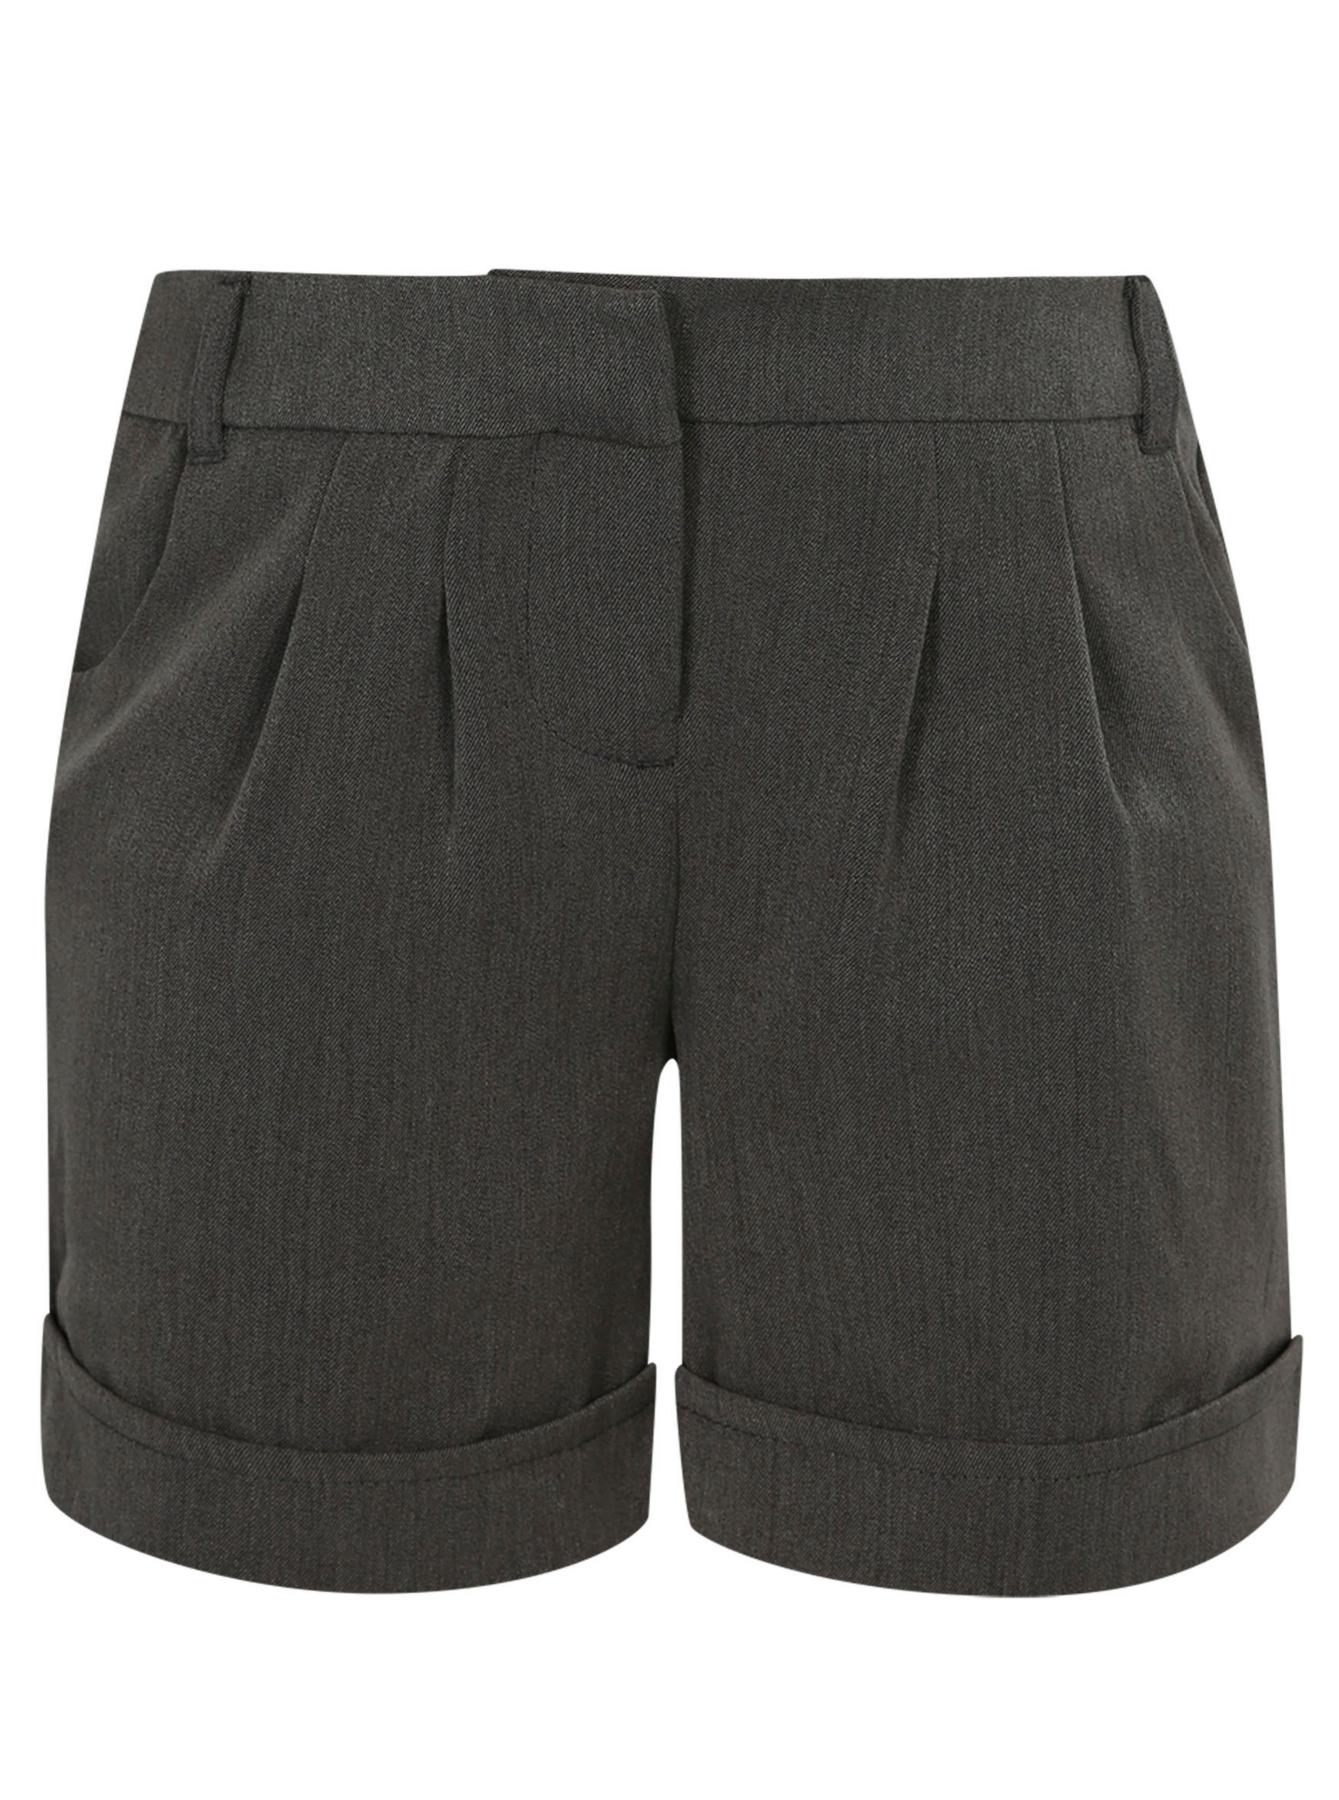 Girls School Uniform Shorts Girls School Pleat City Shorts